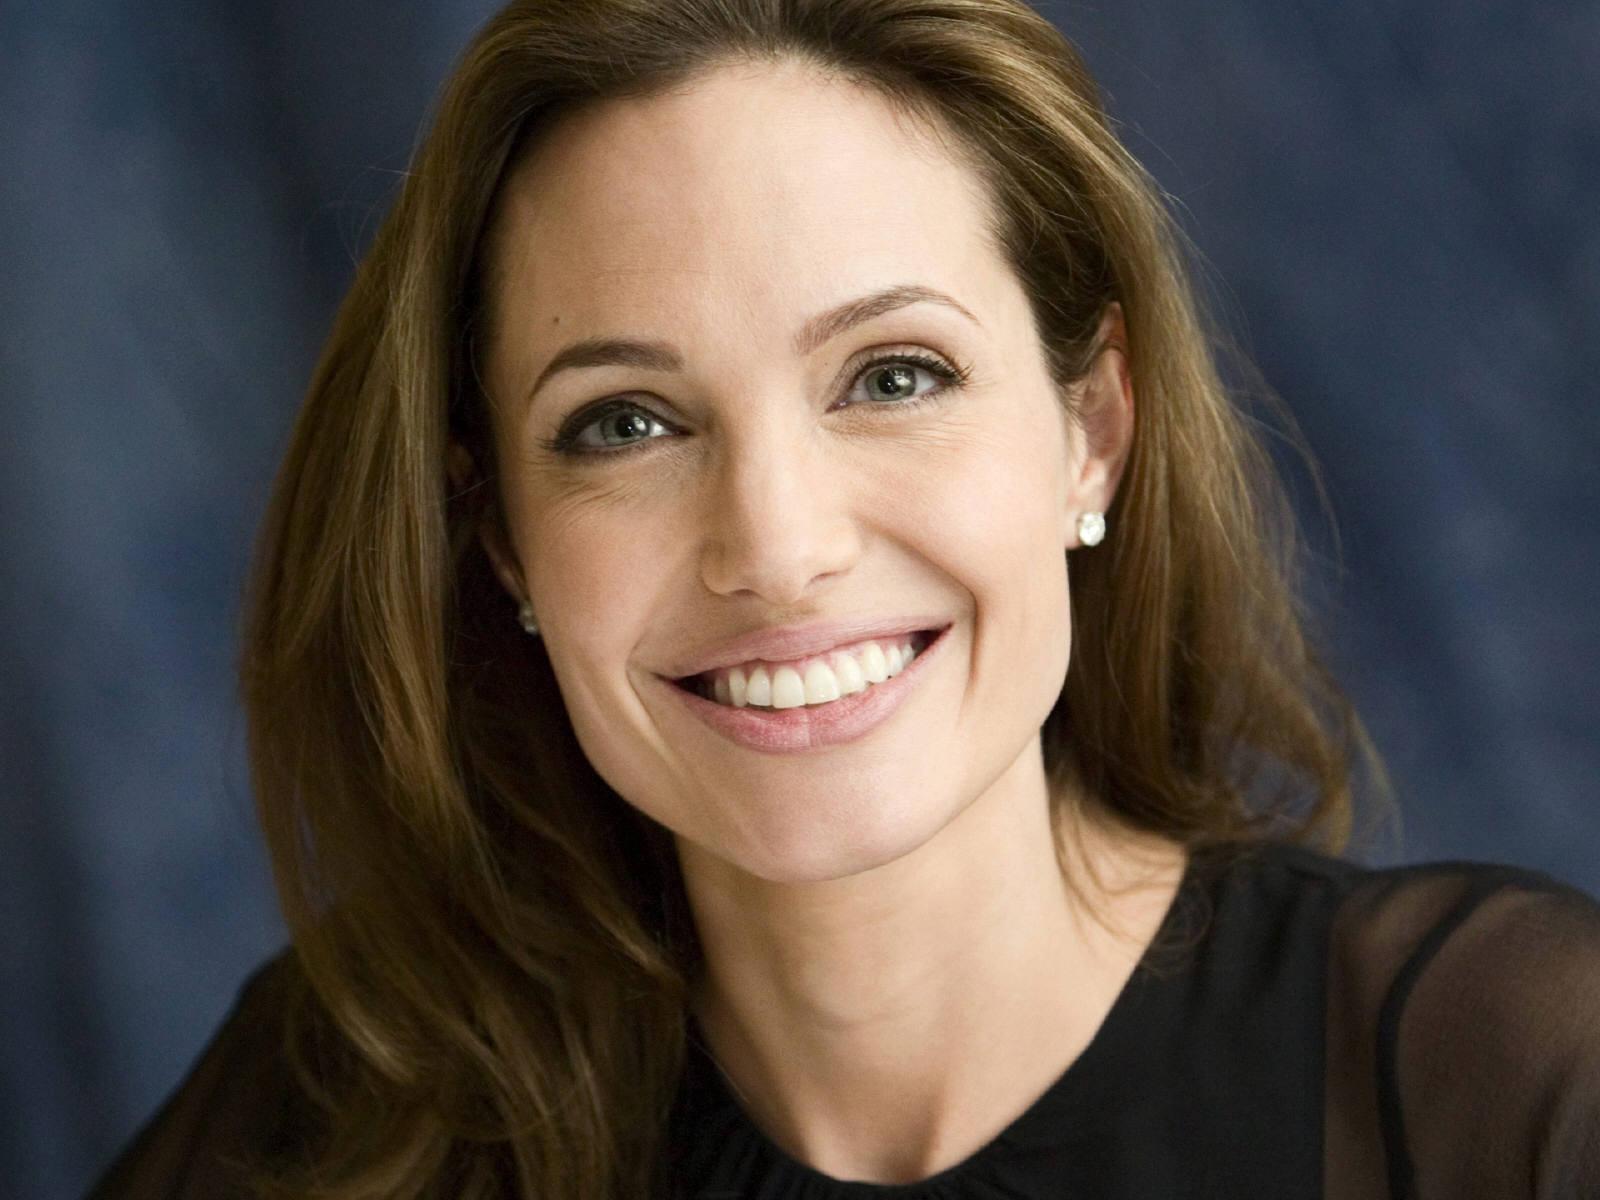 Angelina Jolie photos Angelina Jolie Wallpaper photos